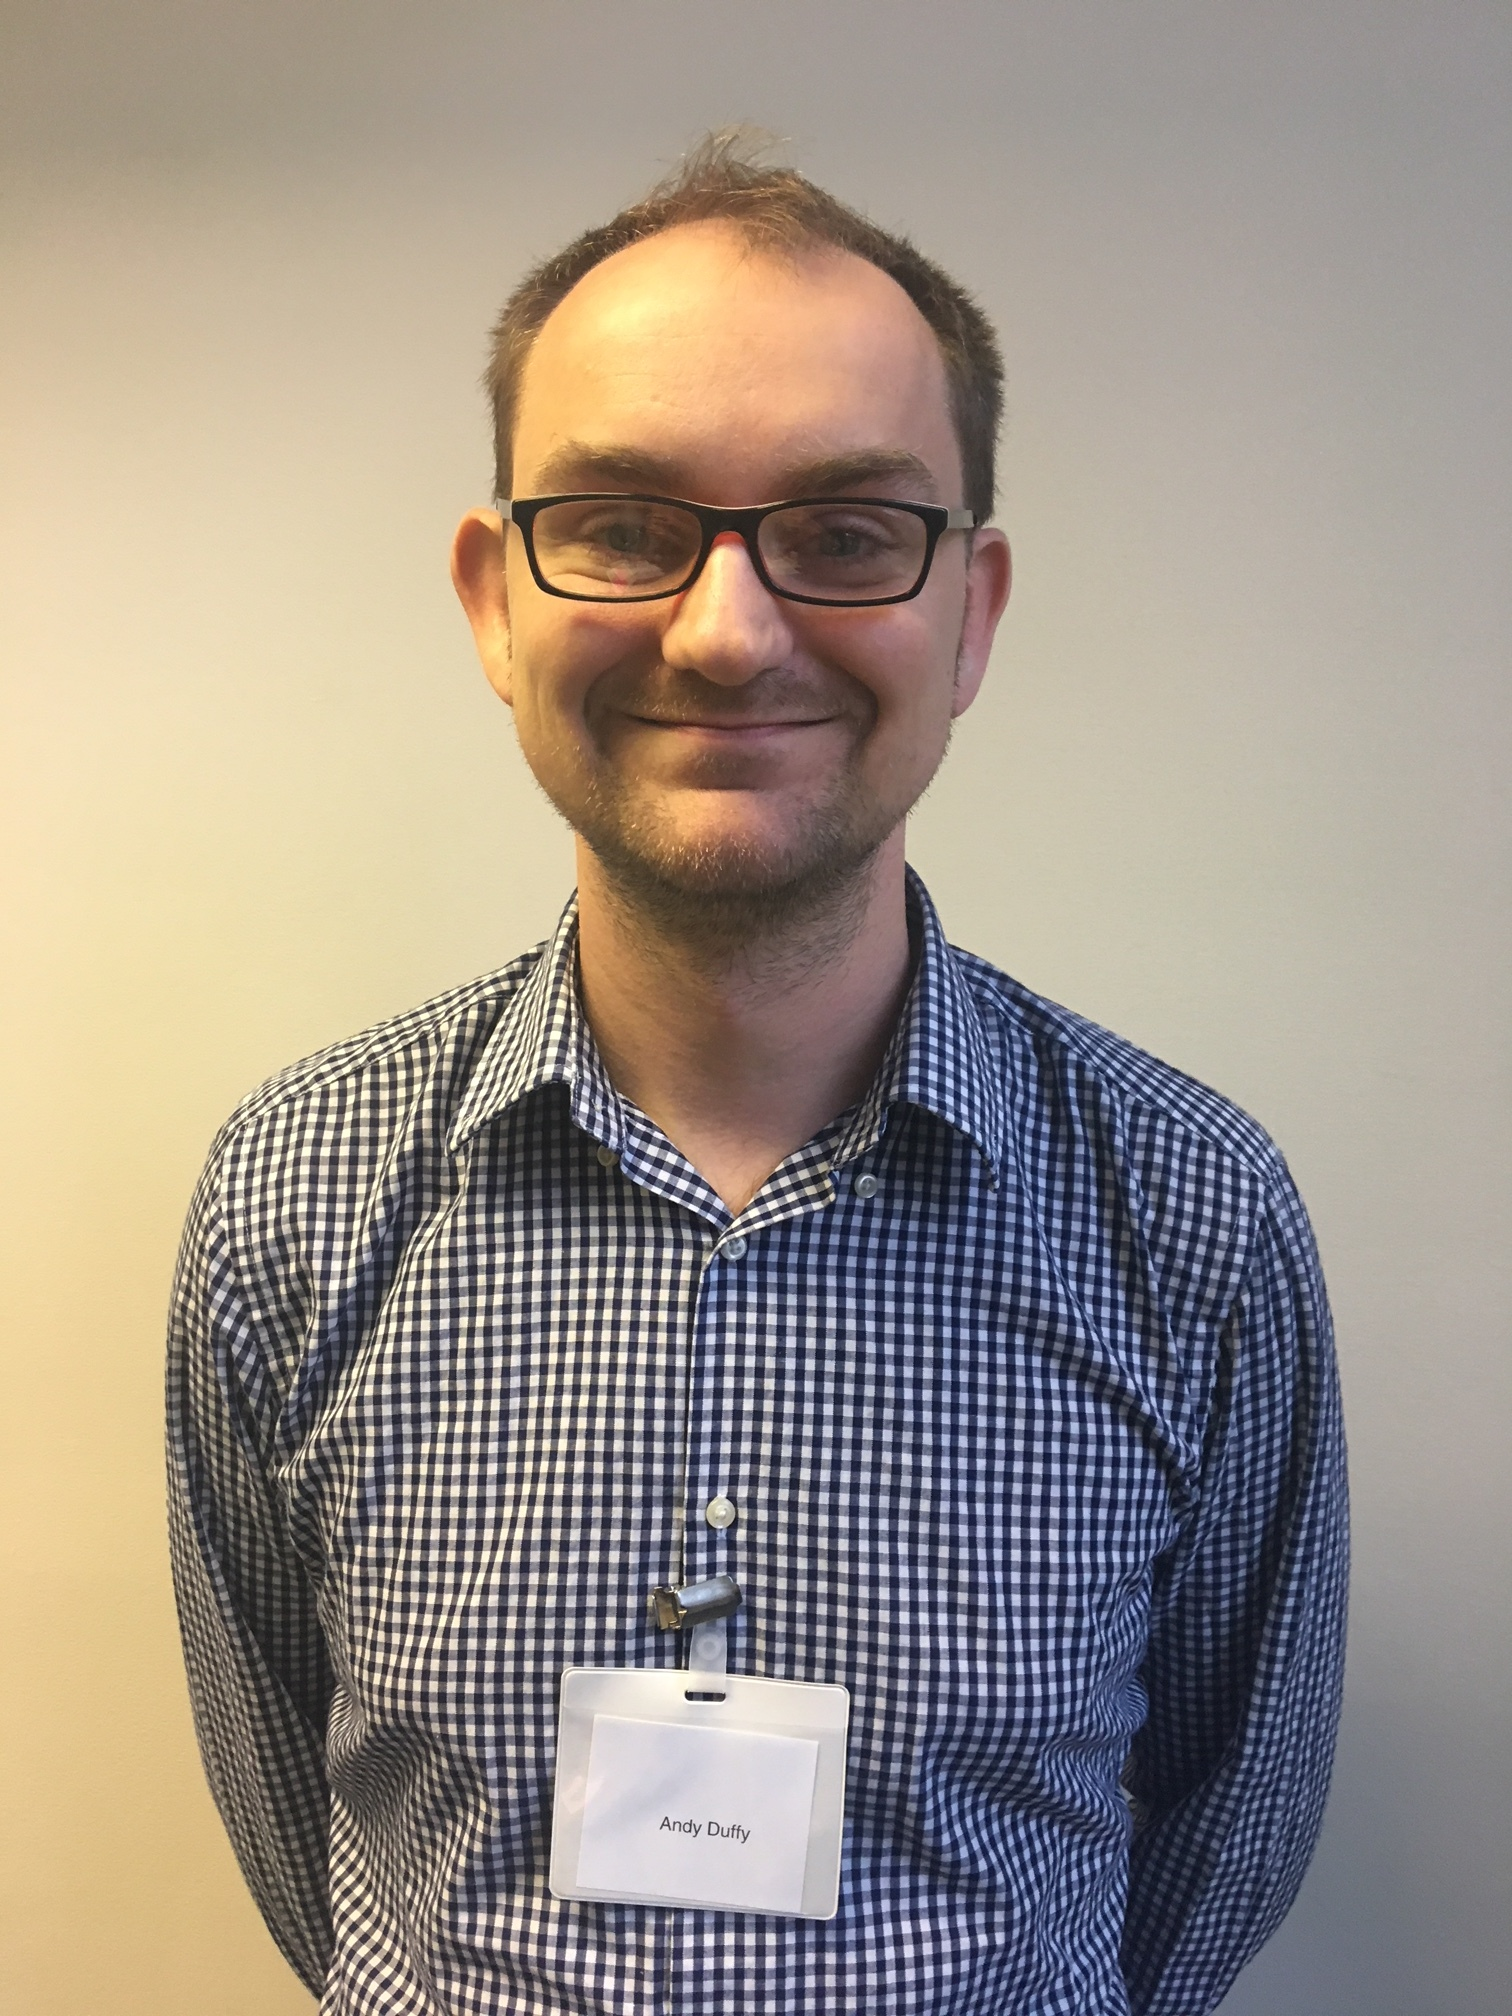 Andy Duffy - Senior Analyst